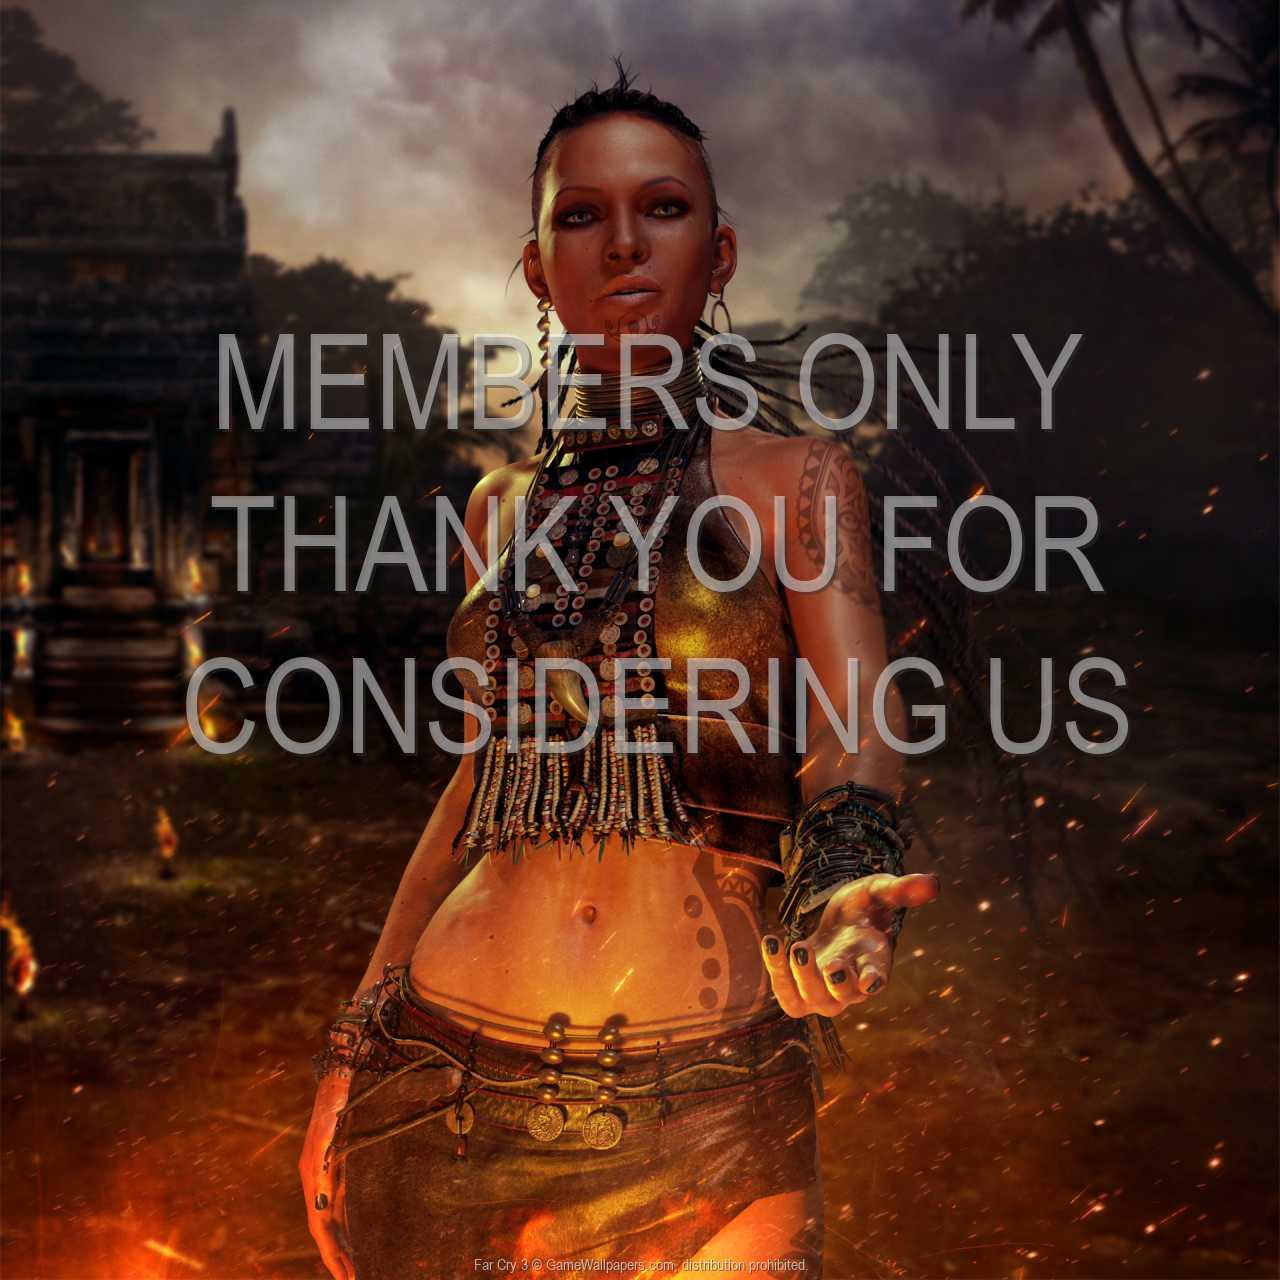 Far Cry 3 Wallpaper 06 720p Horizontal